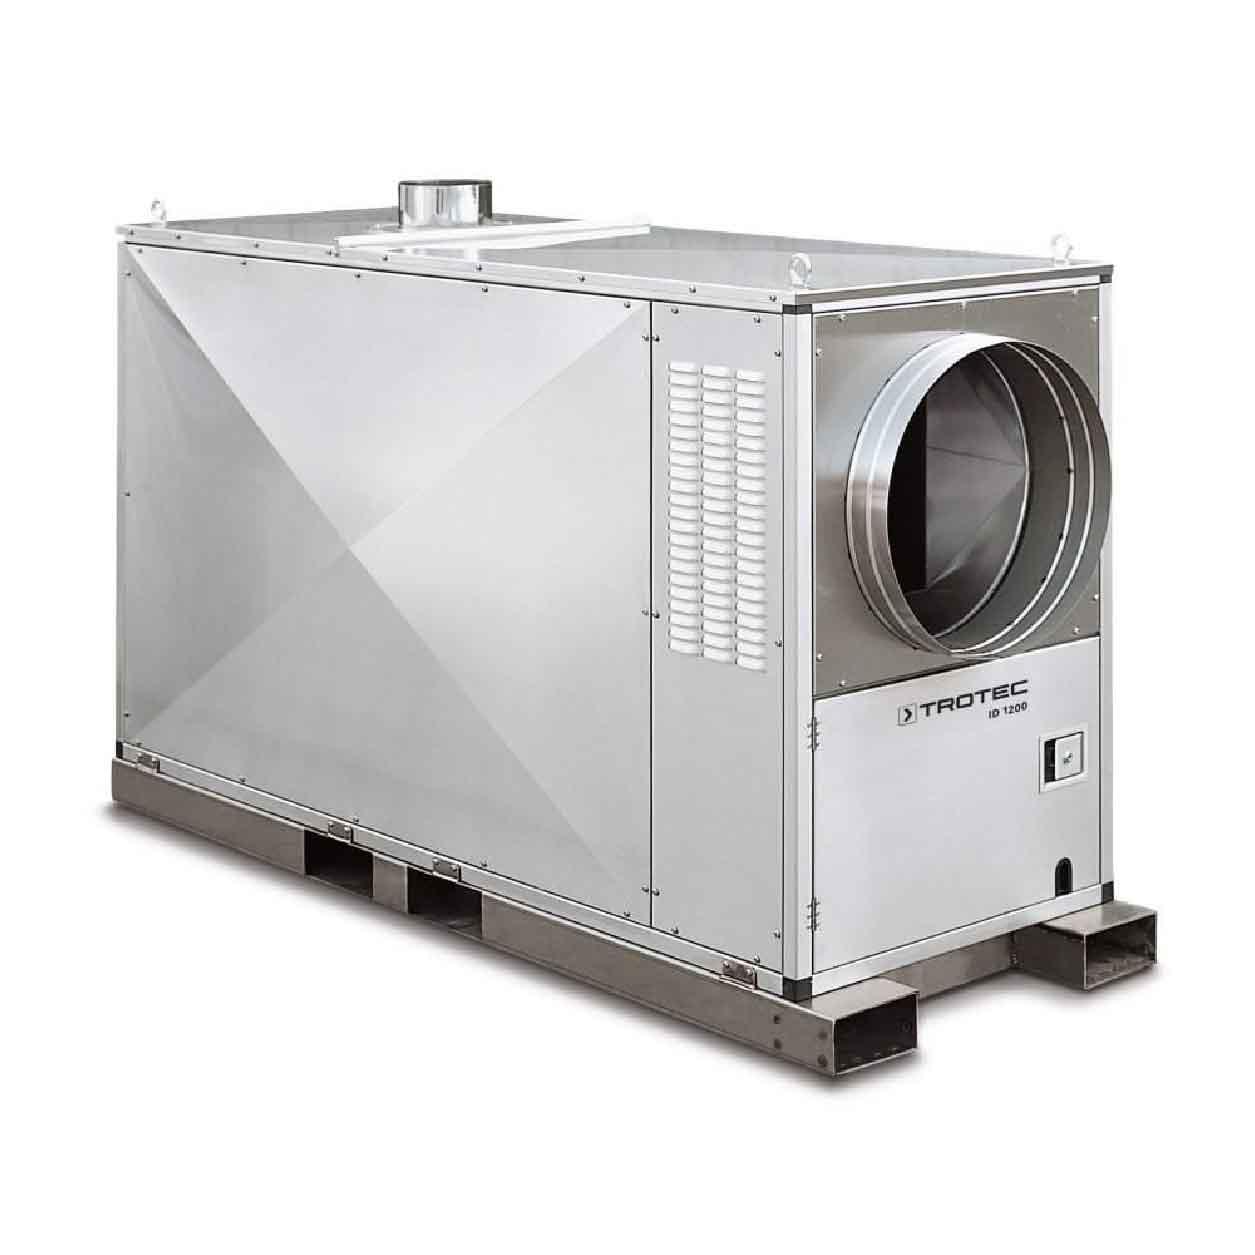 Centrale de chauffage au fioul ID 1200